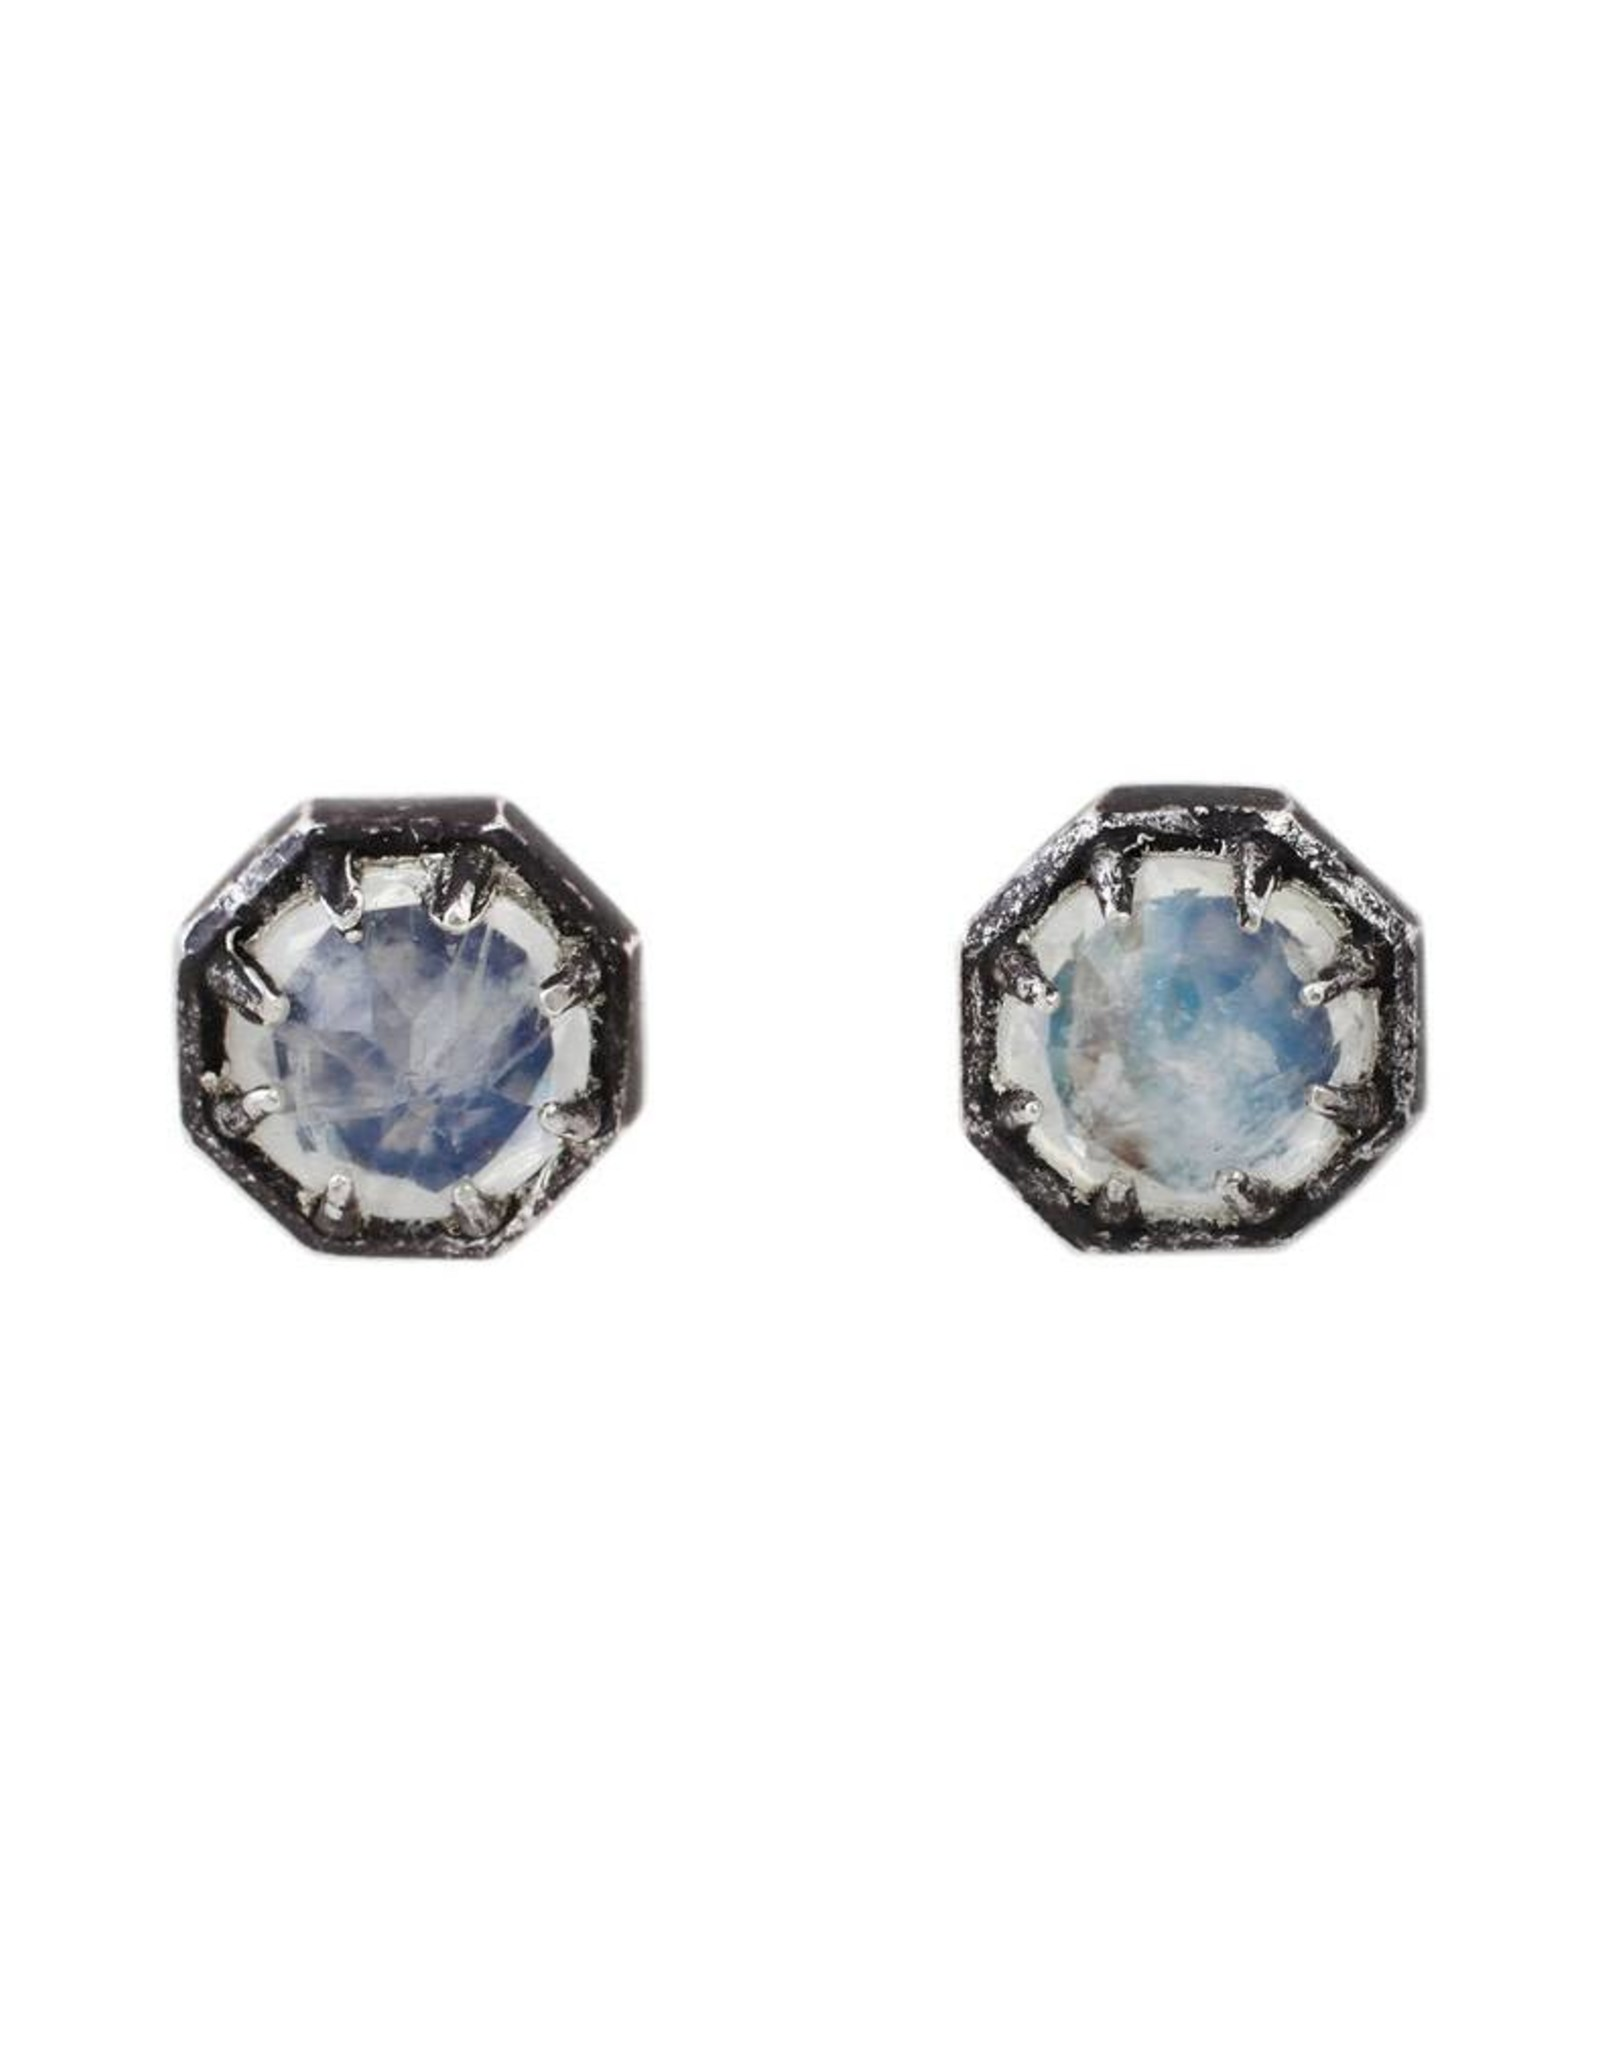 Lauren Wolf Jewelry Oxidized Silver Octagon Studs - Rainbow Moonstone